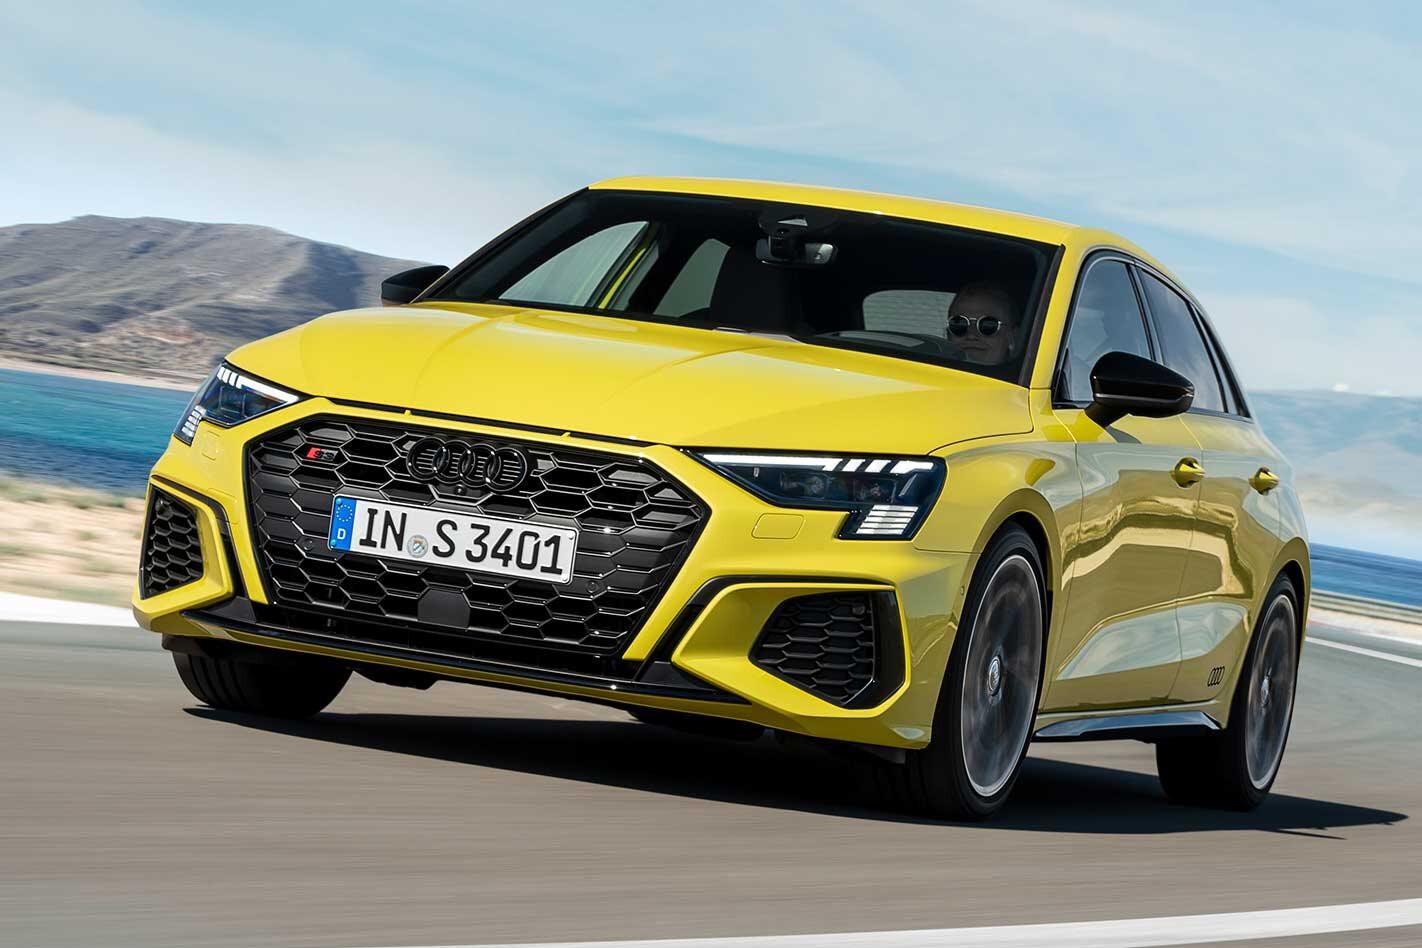 2021 Audi S3 Sportback driving